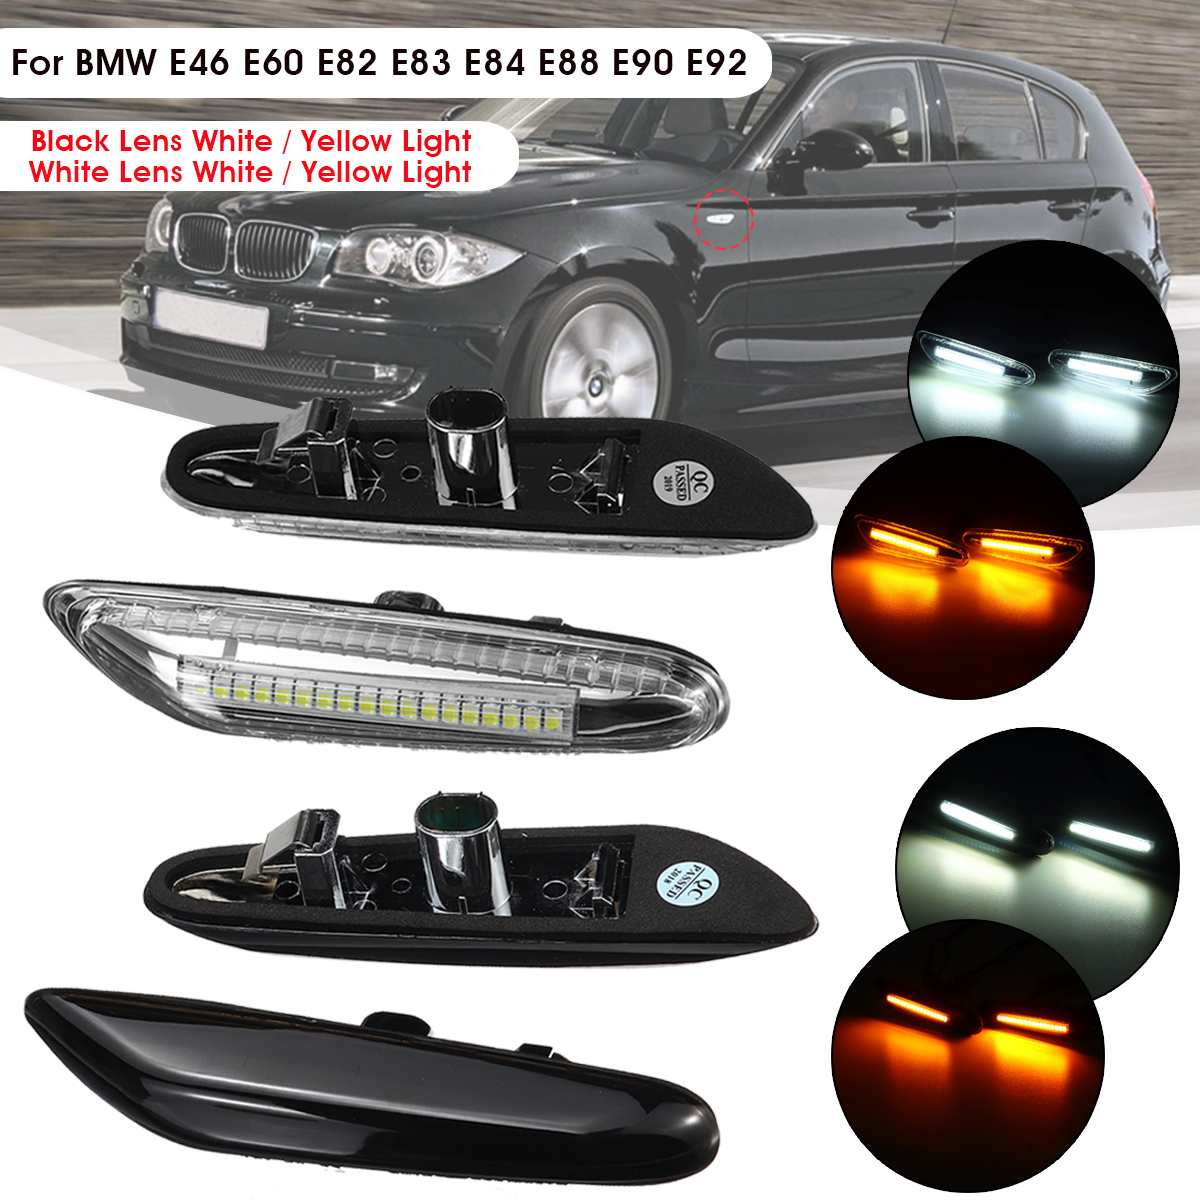 2pcs Car LED Side Marker Lights Repeater Turn Signal Indicator Lamp for BMW  E46 E60 E82 E88 E90 E92 E93